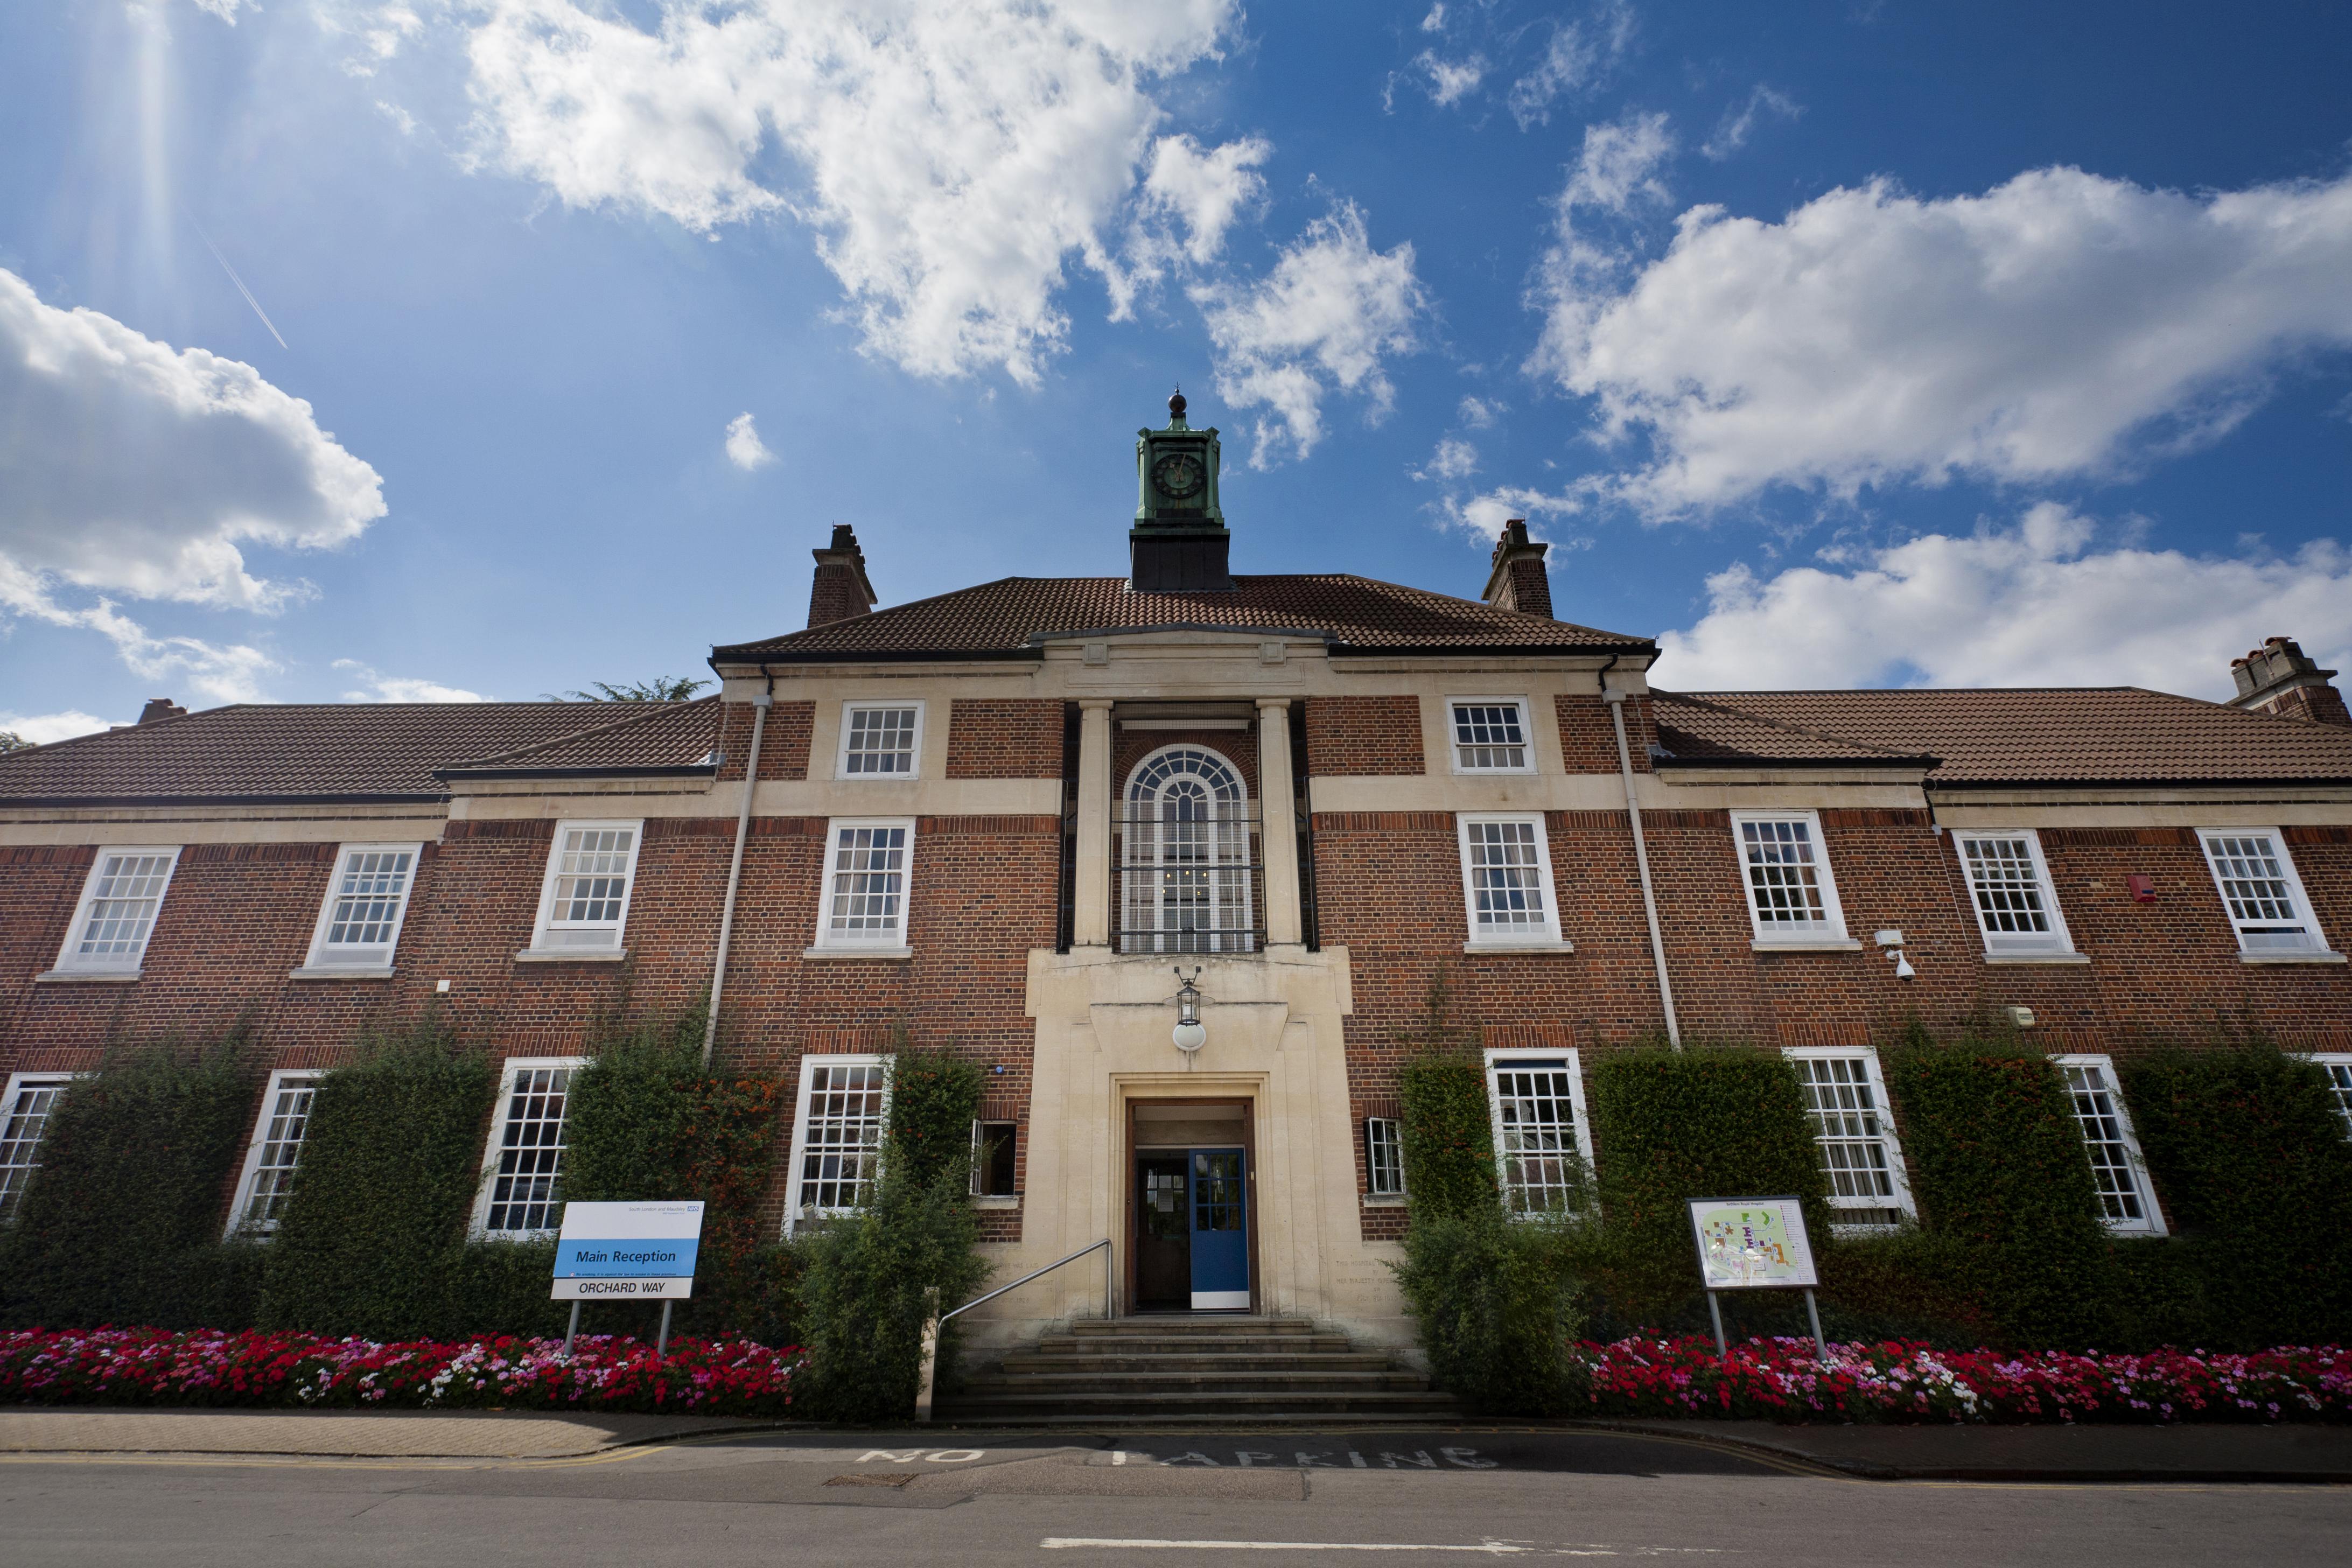 Bethlem_Royal_Hospital_Main_building_view_1